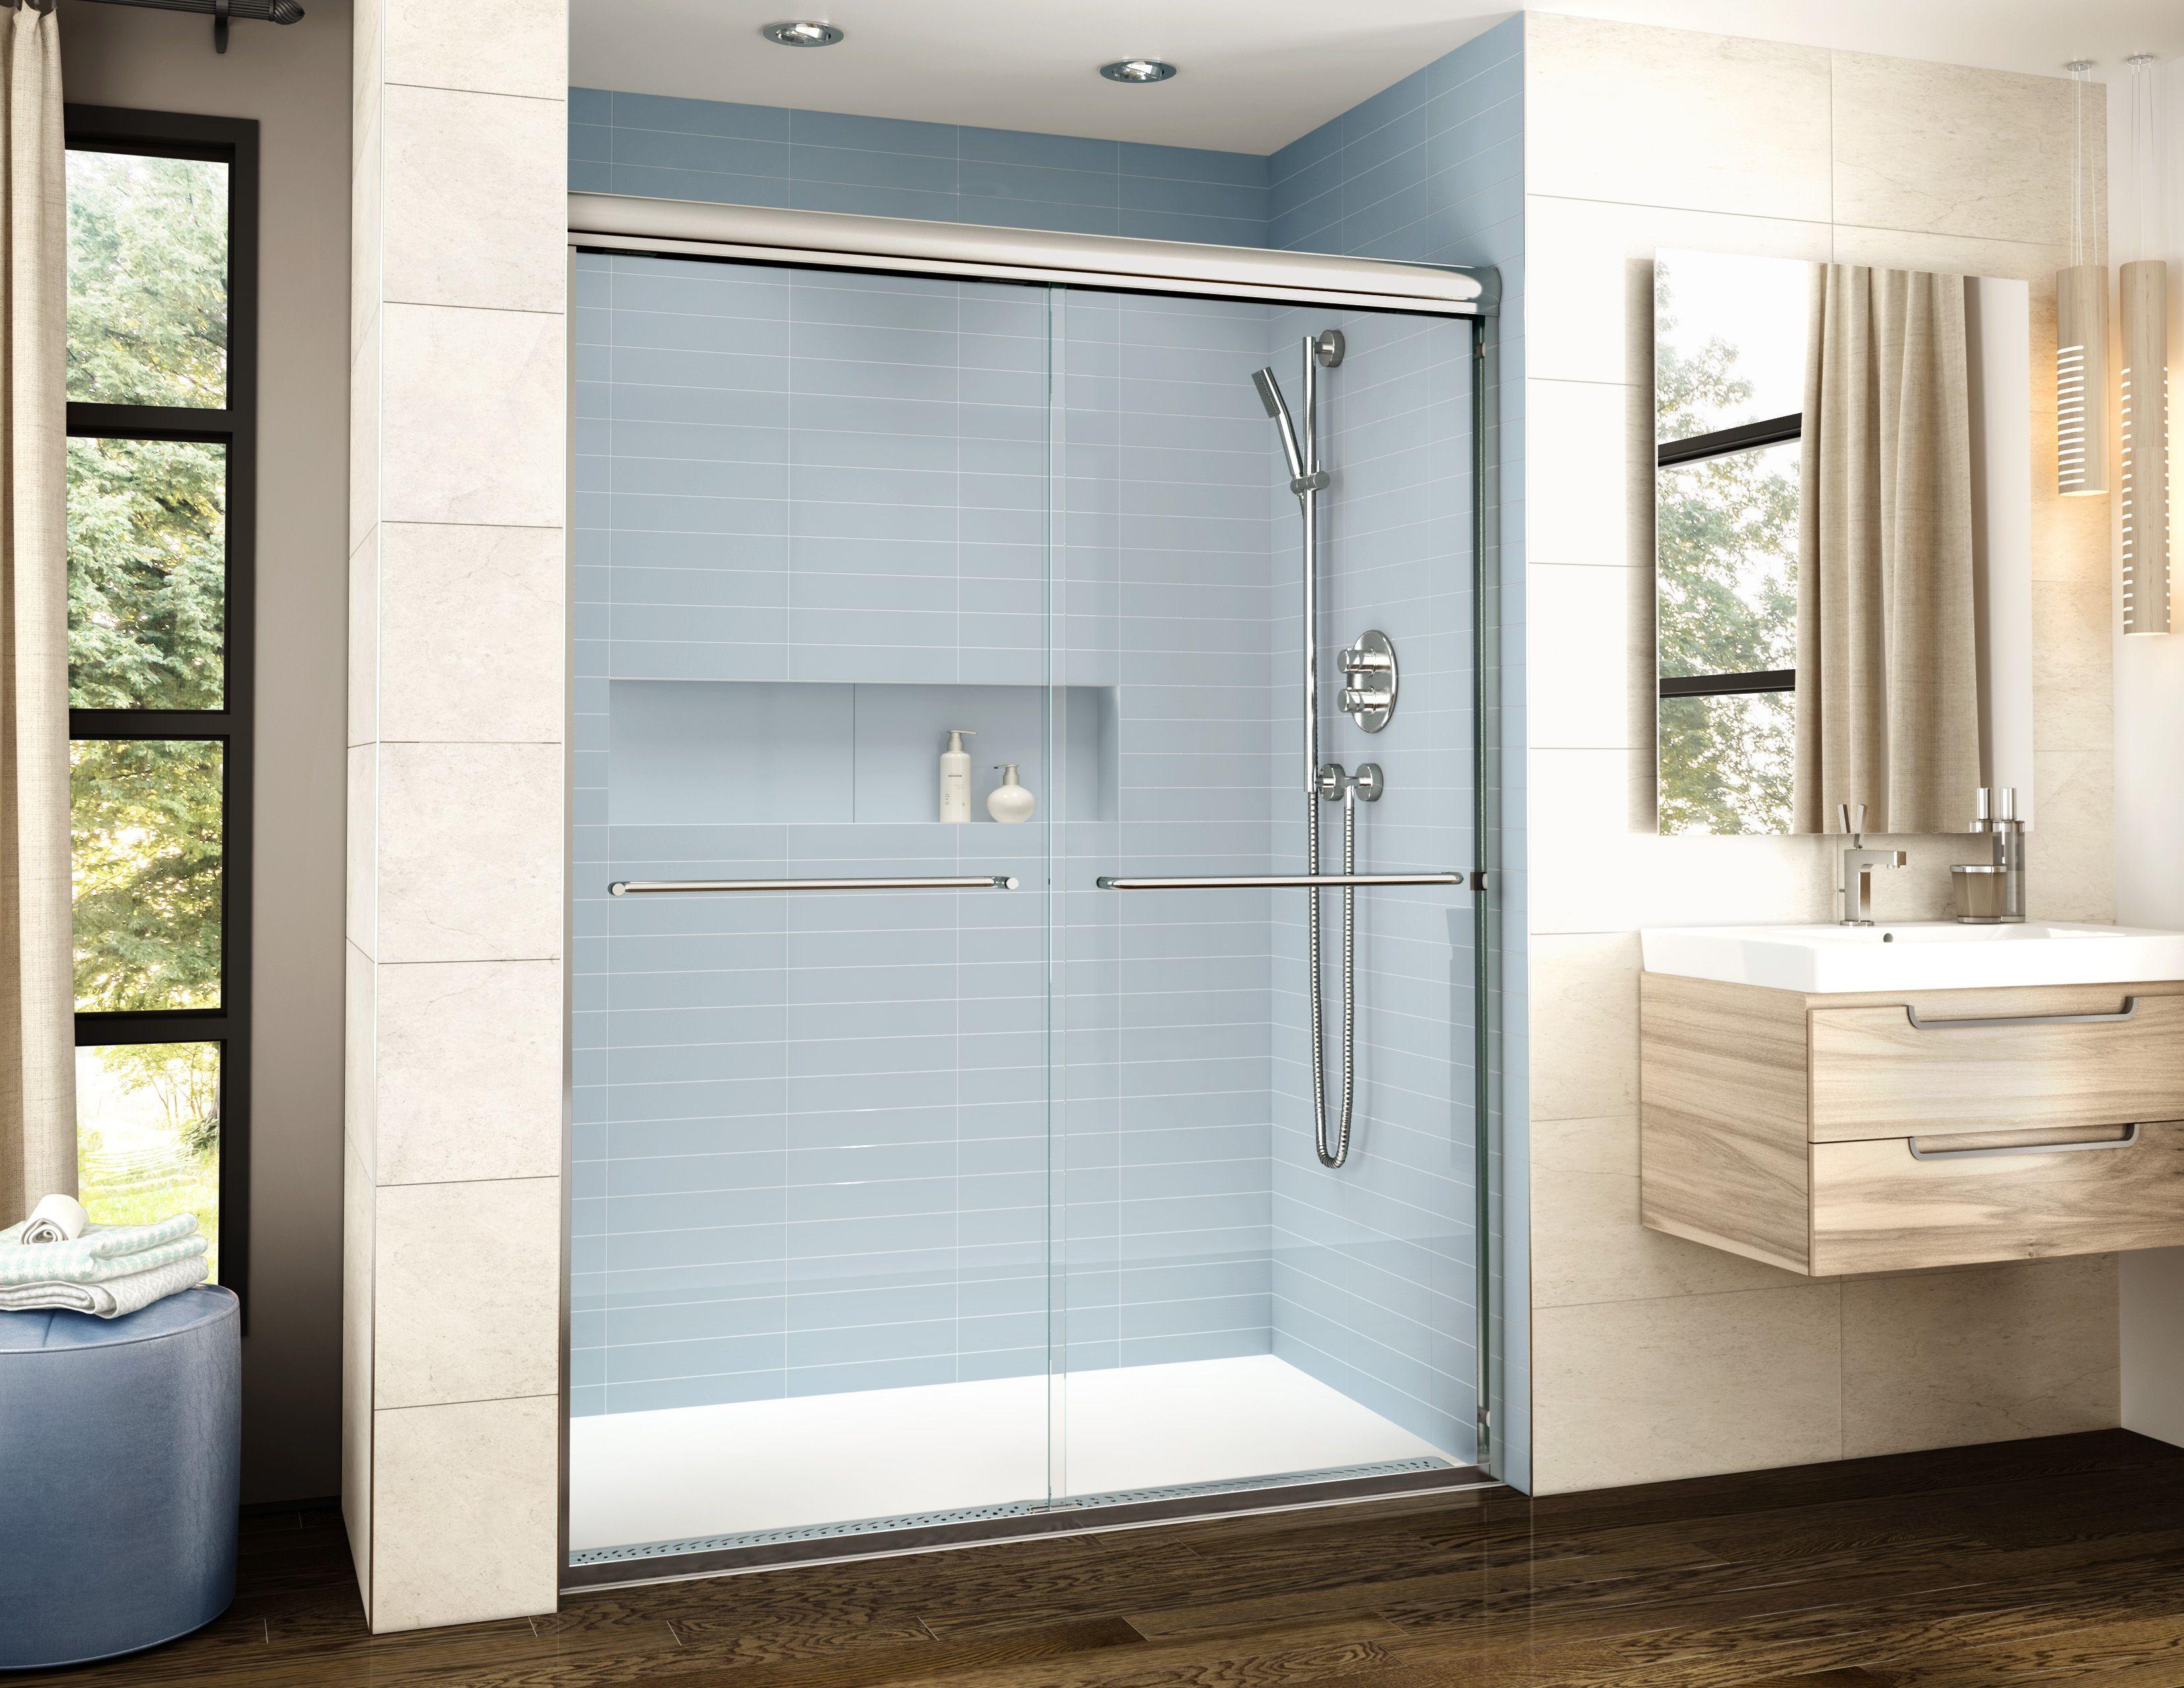 Great ADaptek Shower Base And The BANYO Cordoba Shower Door By FLEURCO